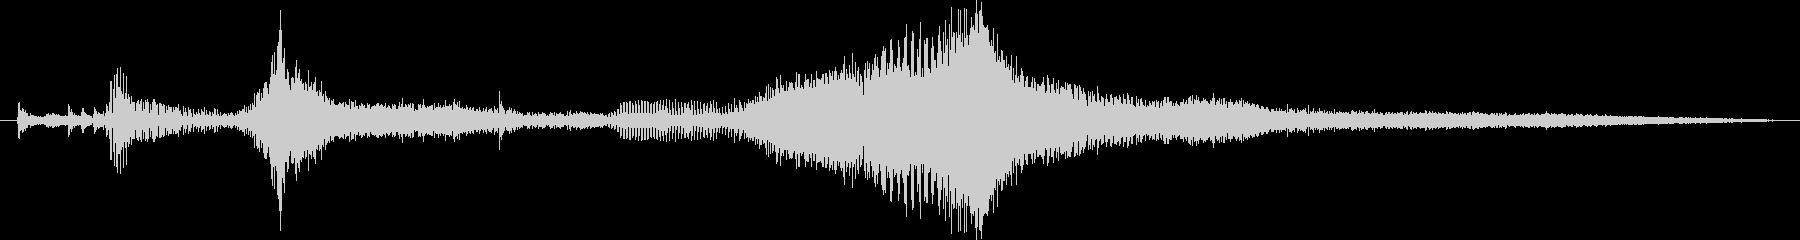 GmキャデラックCts:内線:開始...の未再生の波形